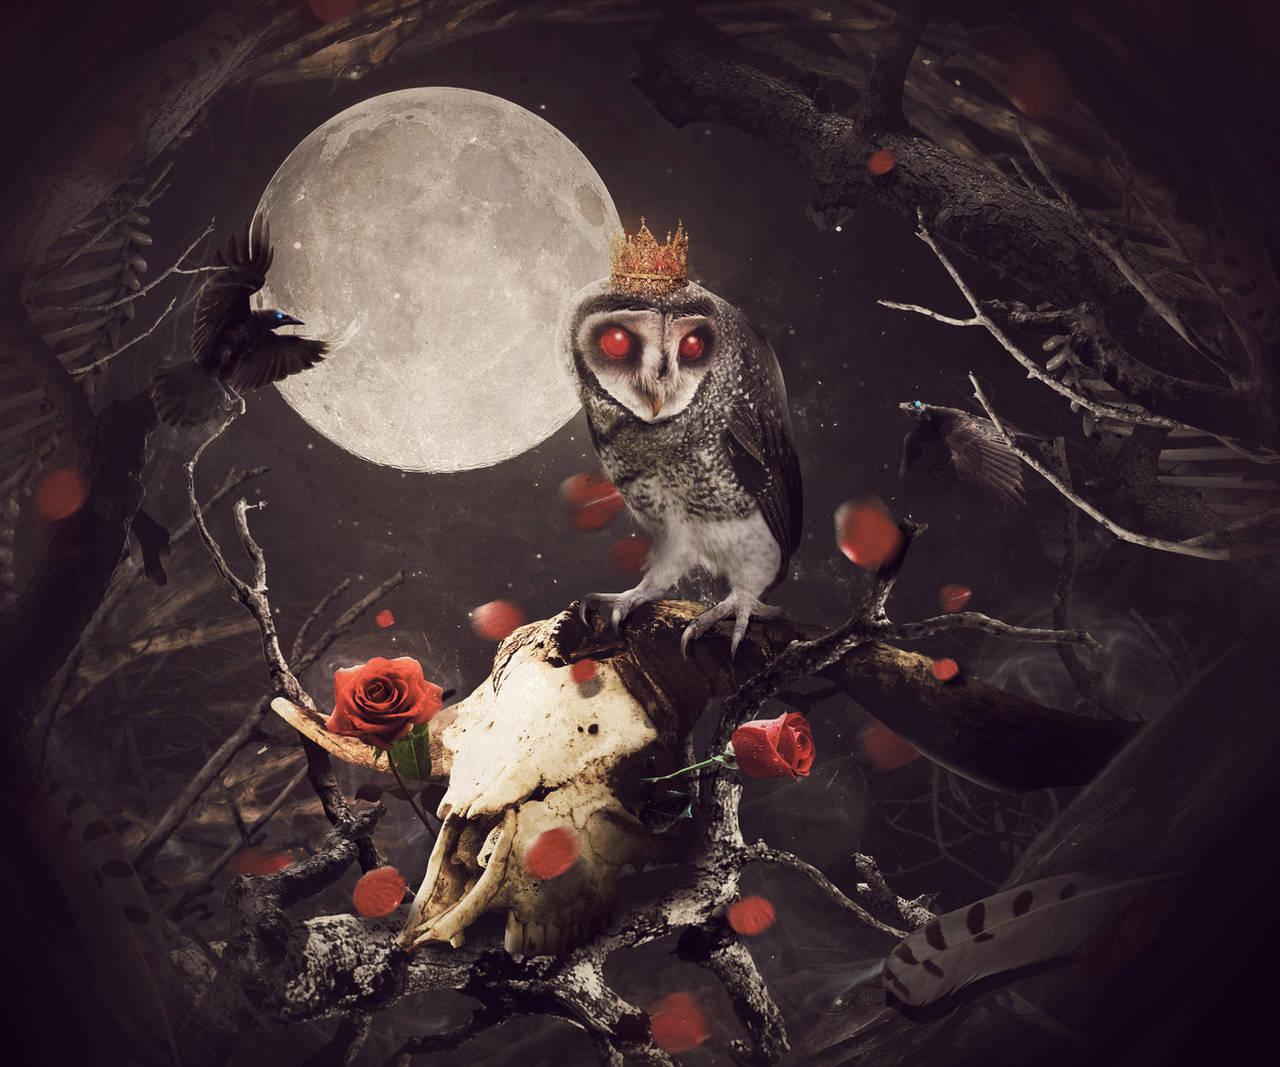 King Owl II by MixeRBink